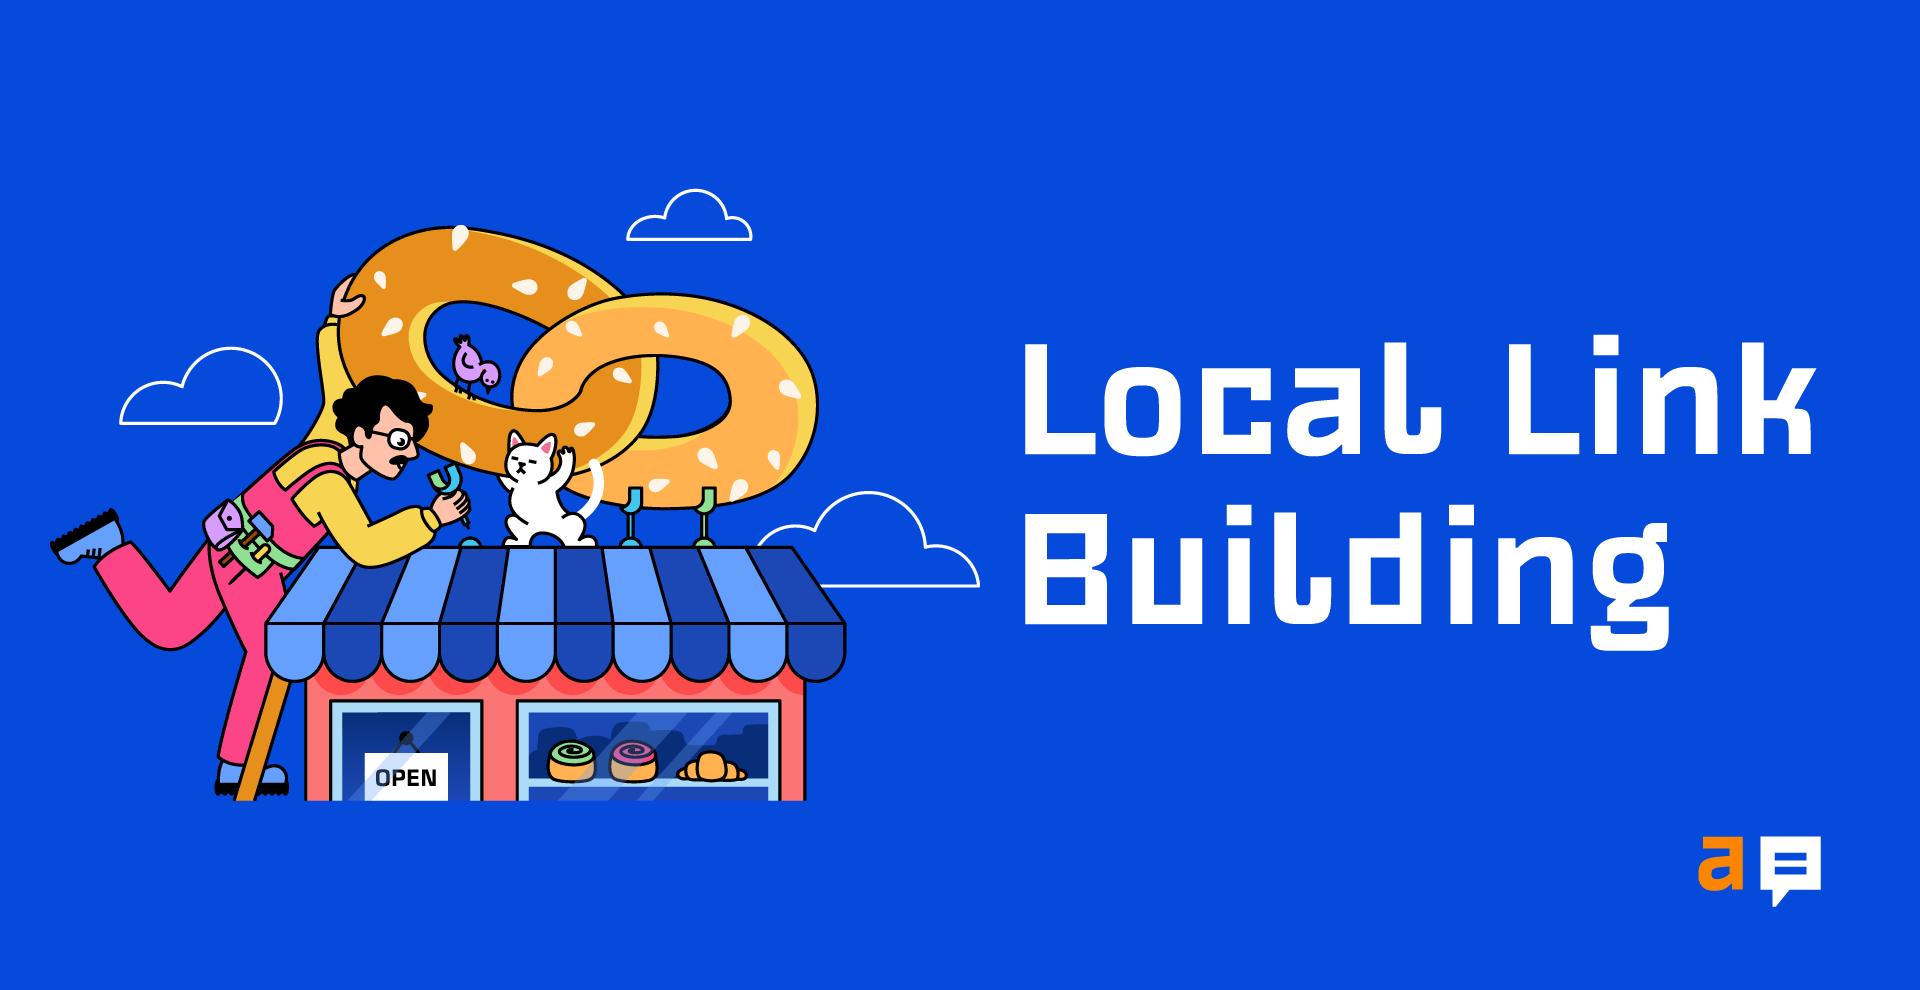 9 Easy Local Link Building Tactics